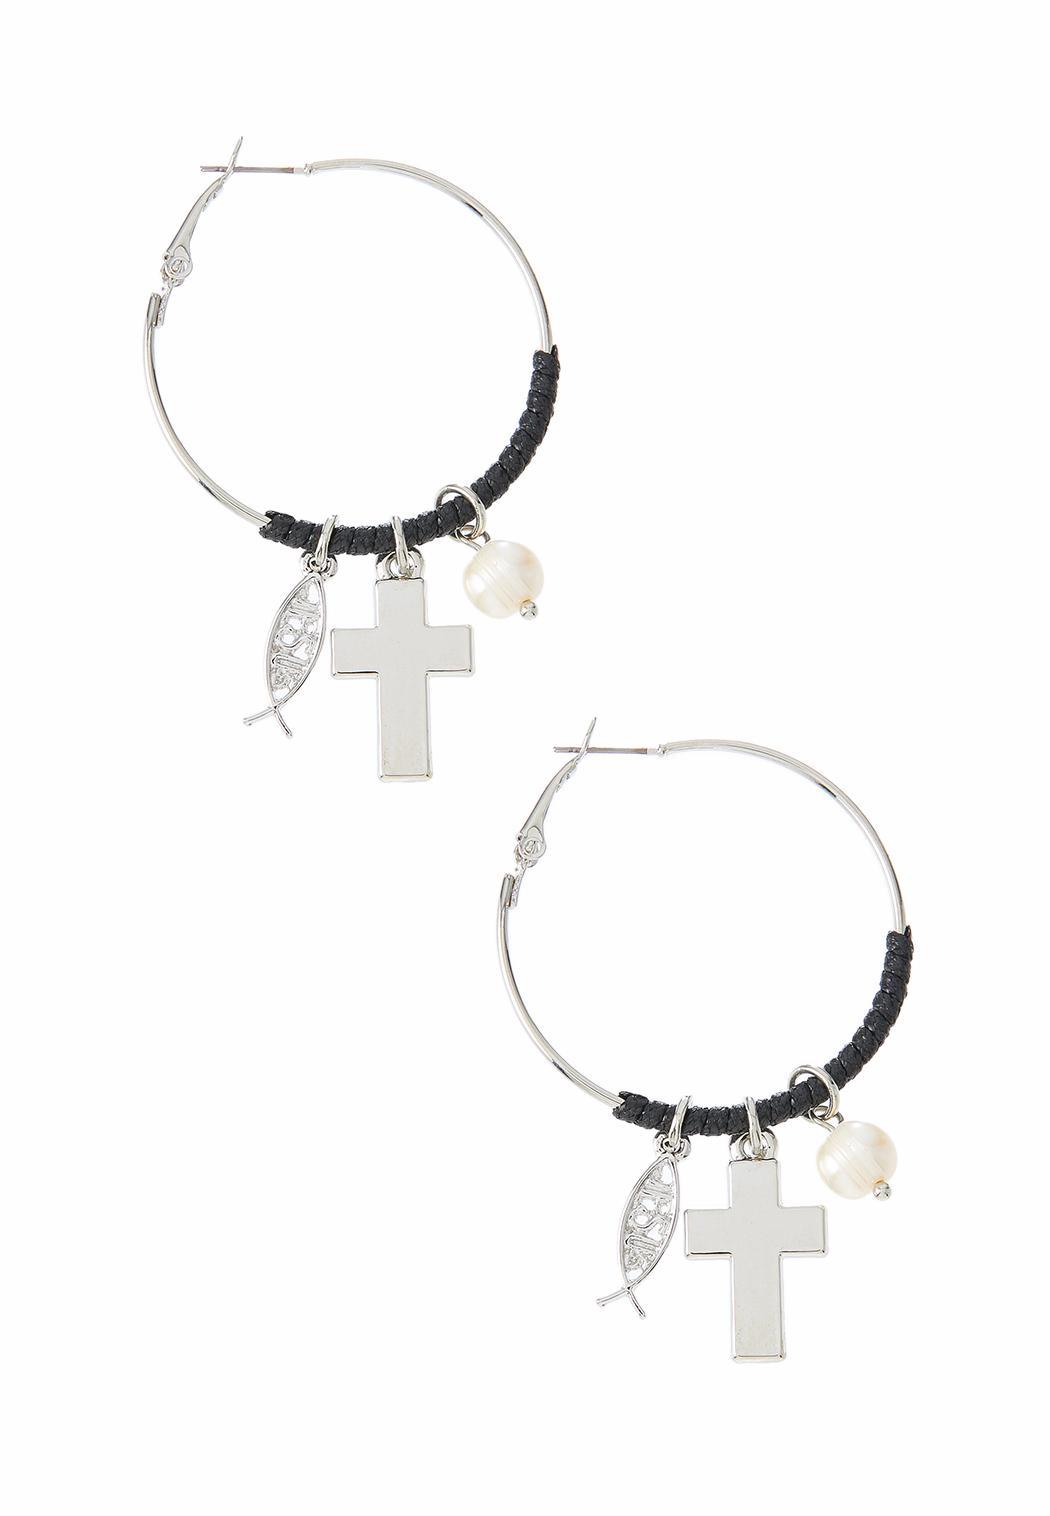 Inspirational Charm Hoop Earrings